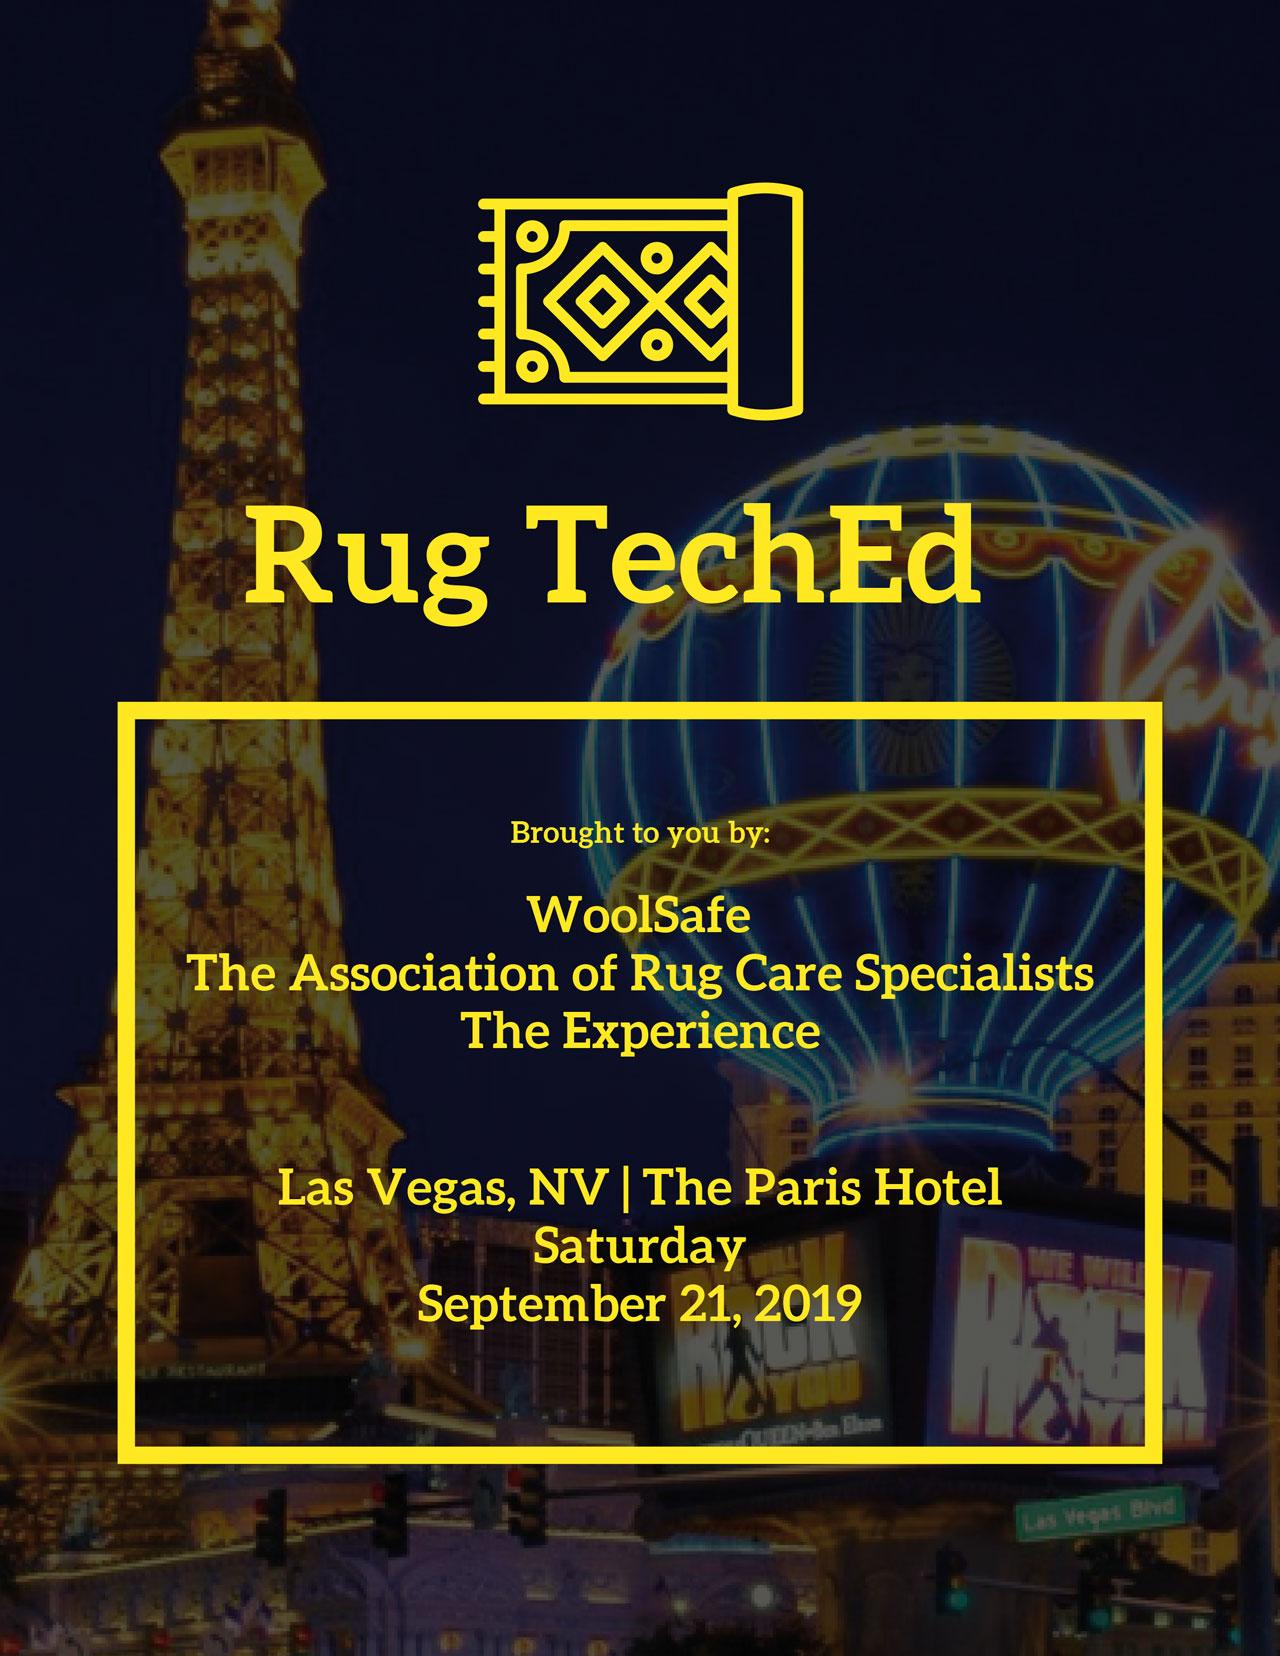 Rug-TechEd-Schedule1.jpg